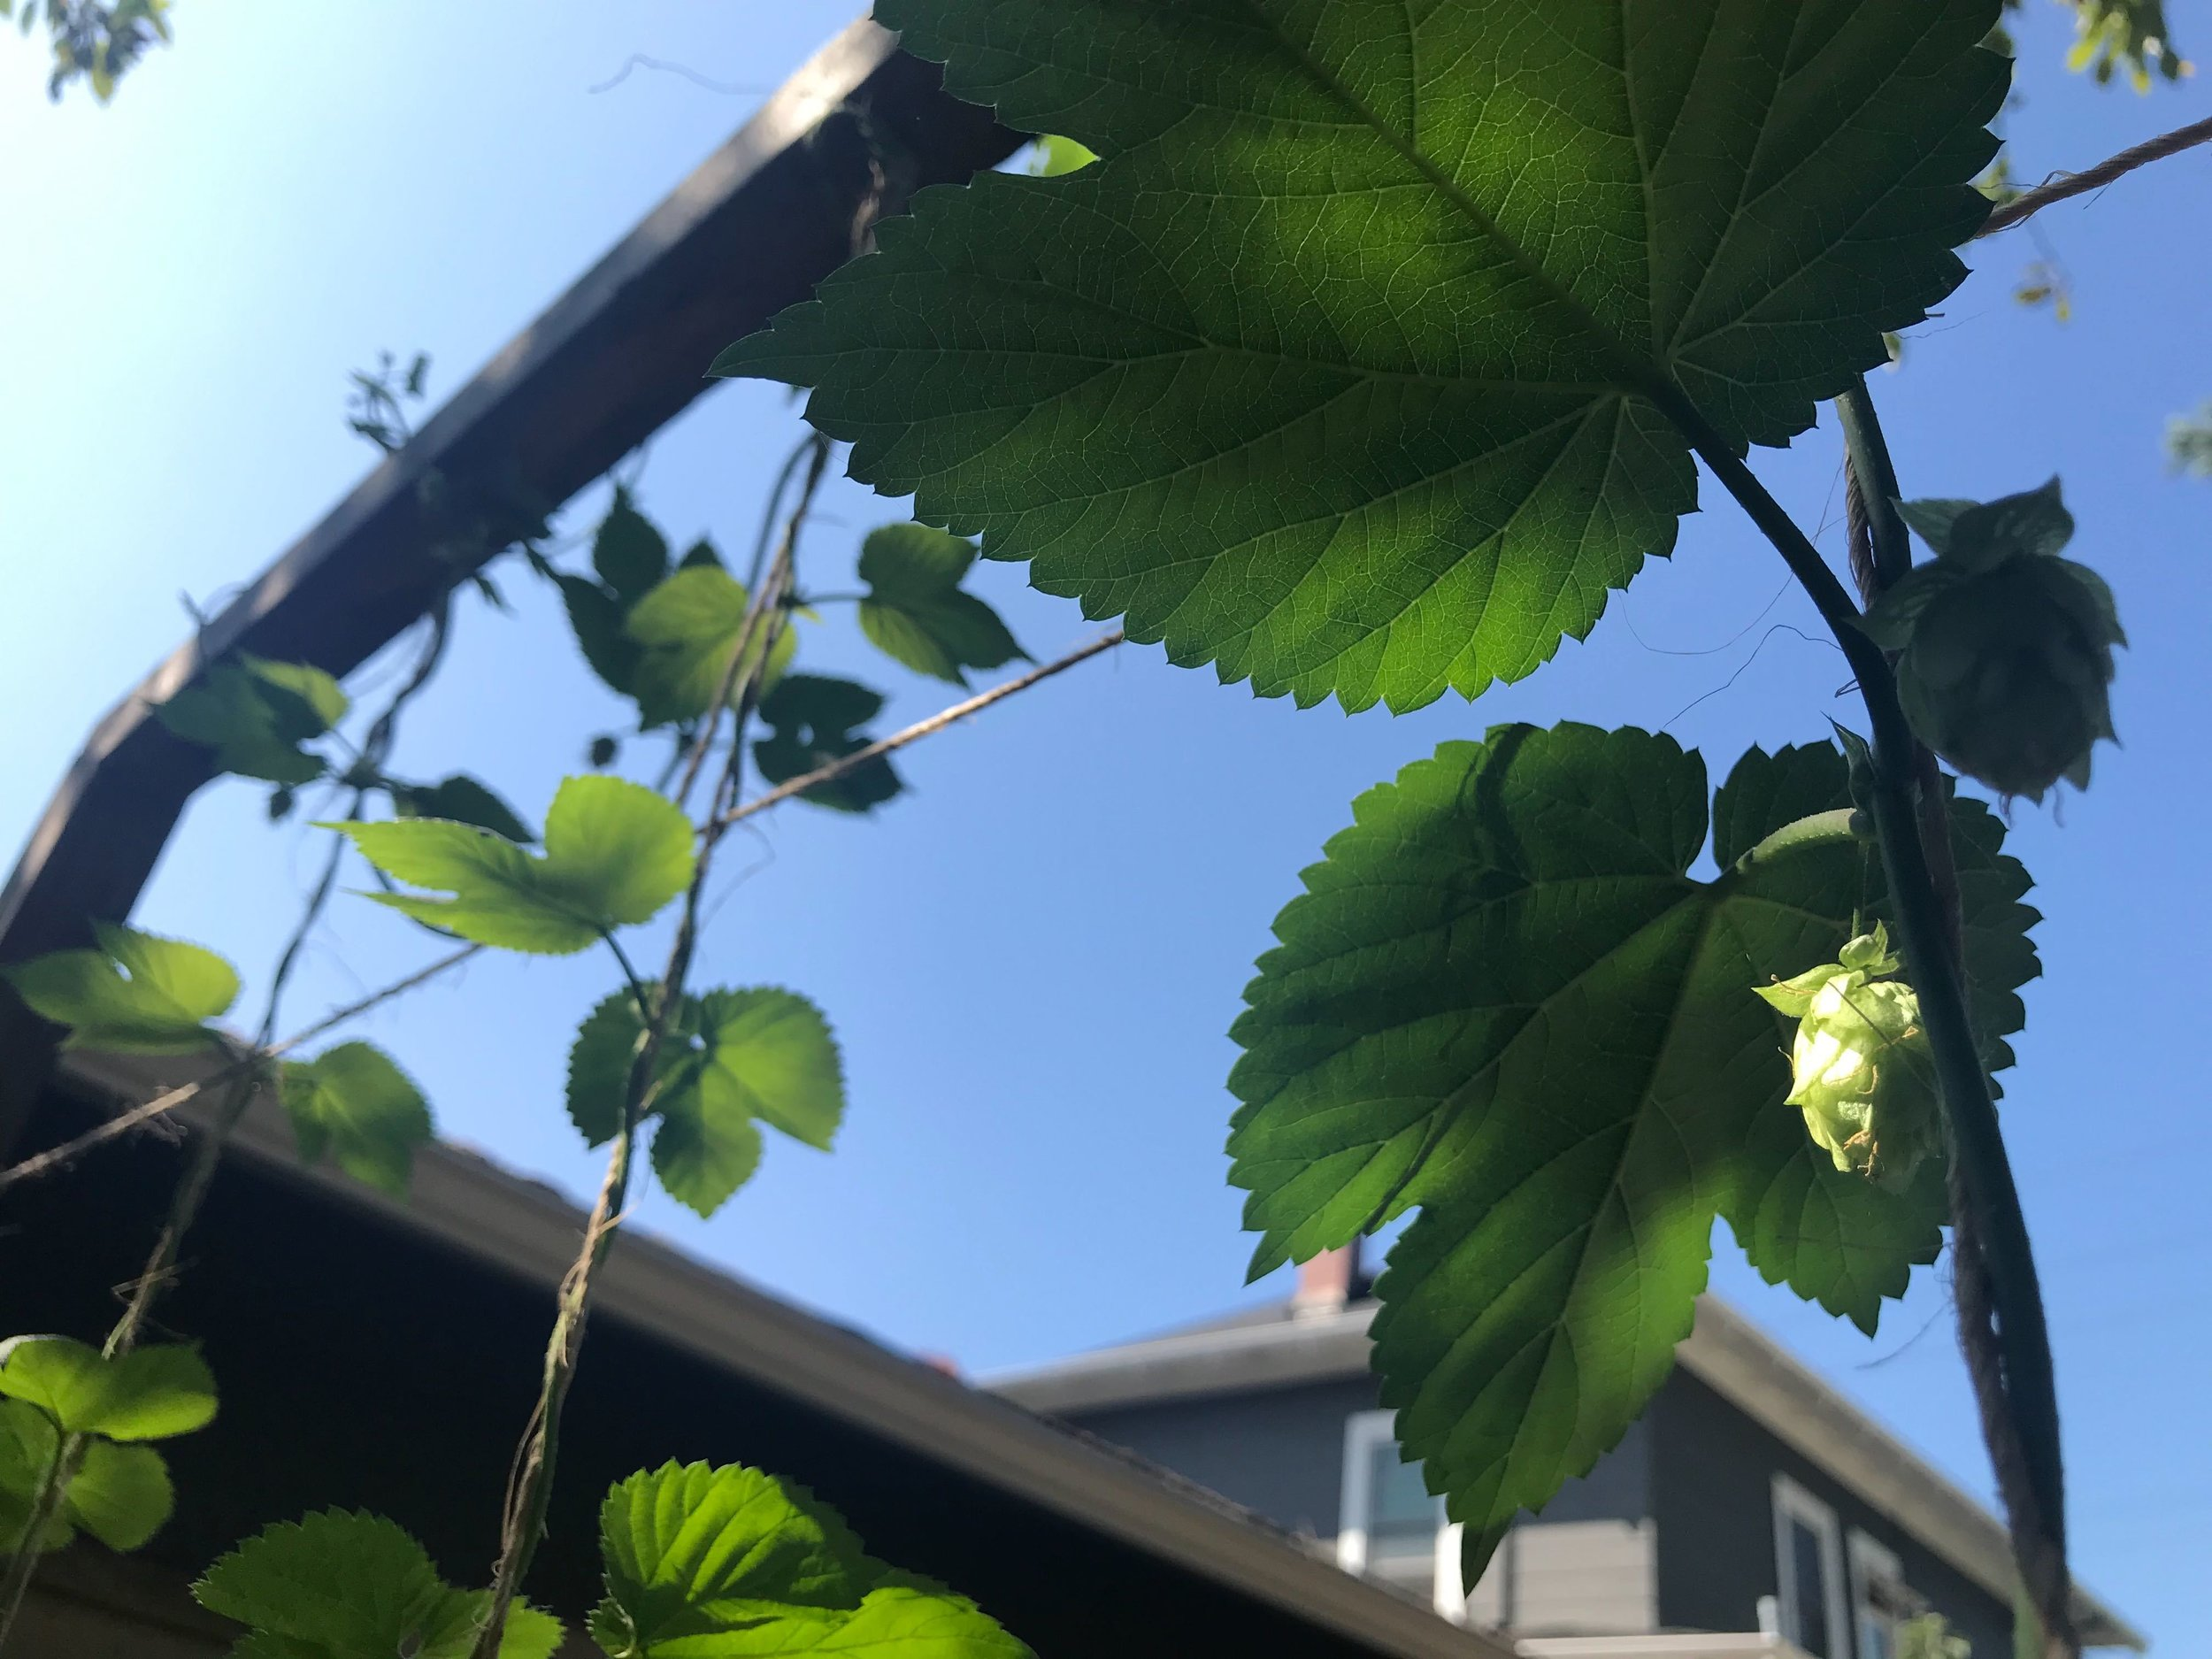 Hops in the Sun